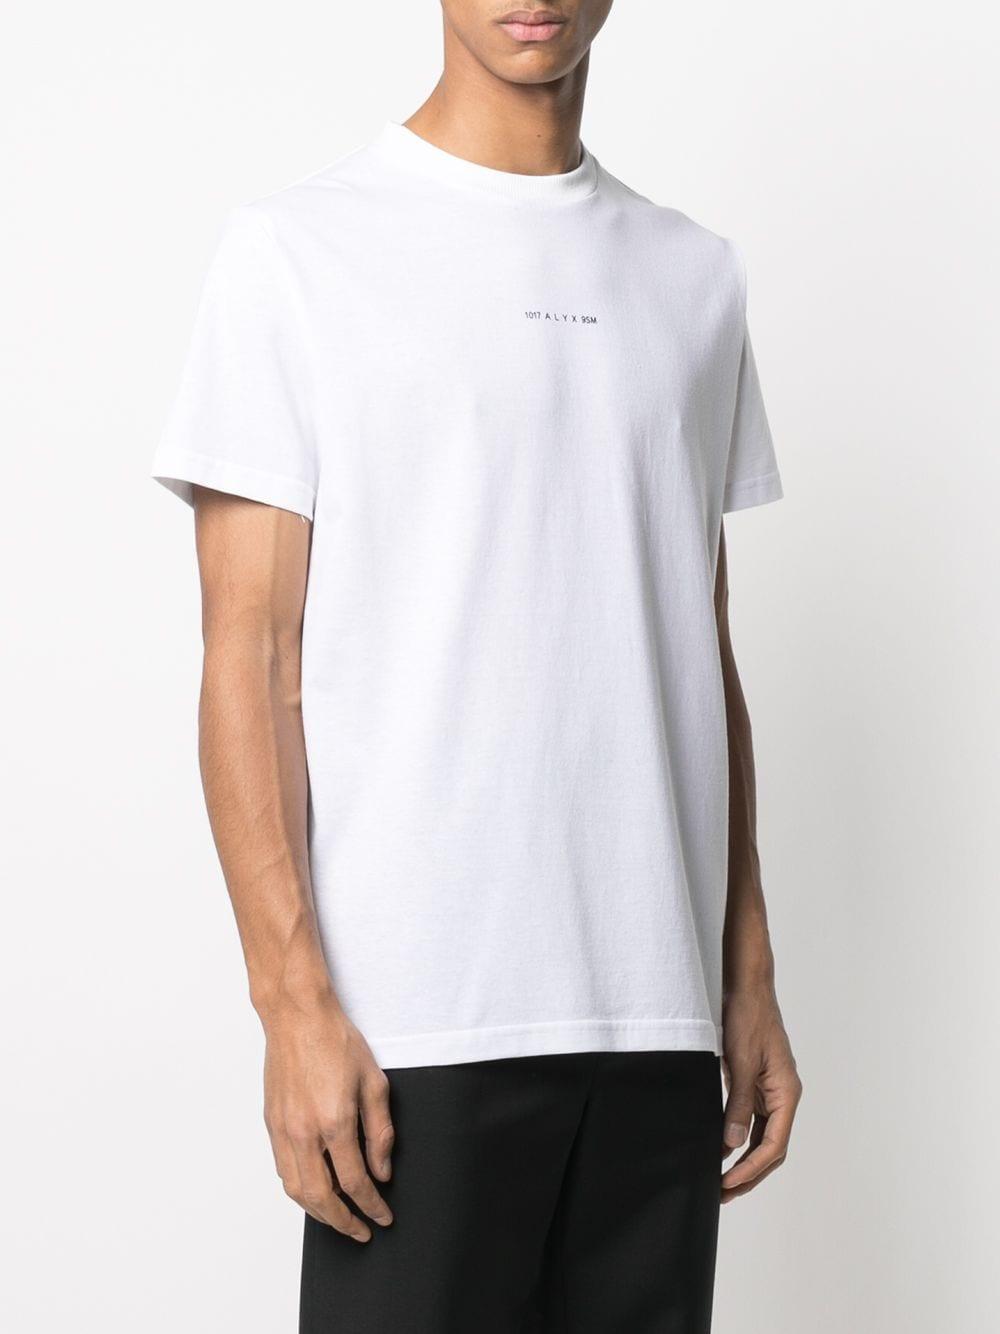 1017 Alyx 9sm logo t-shirt man white 1017 ALYX 9SM   T-shirts   AVUTS0216FA01WTH001